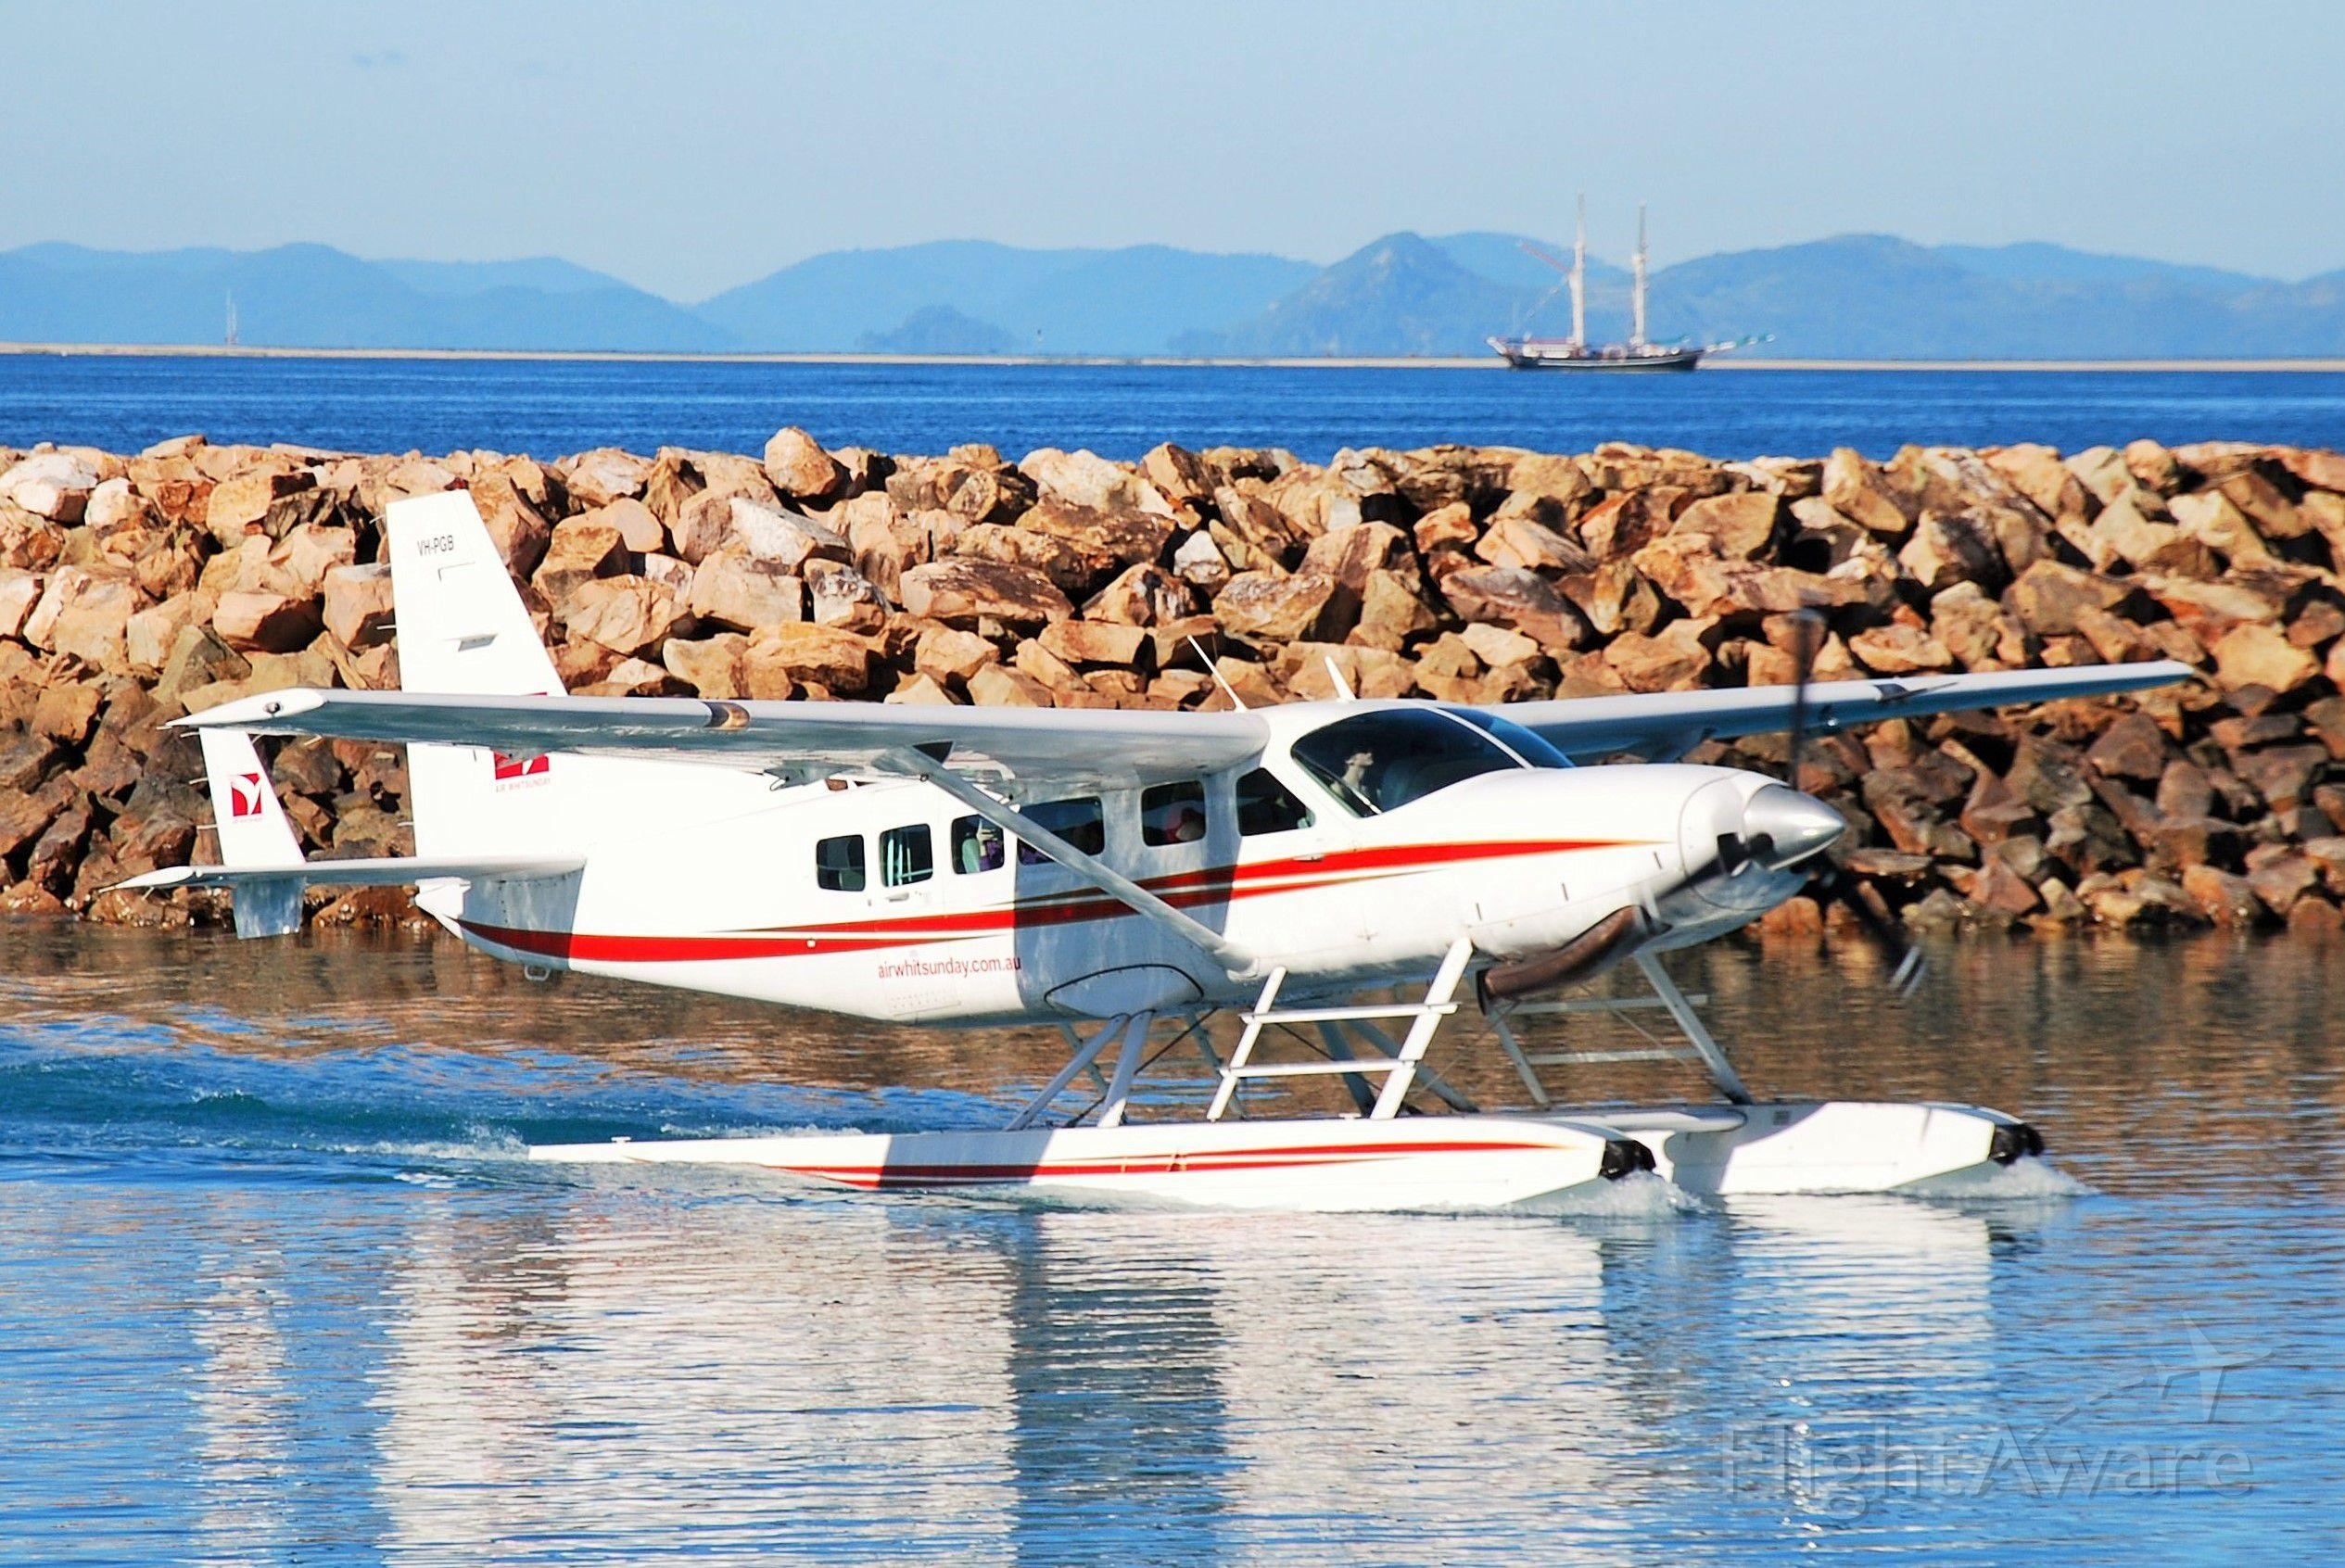 Cessna Caravan (VH-PGB) - Air Whitsundays Cessna 208 Caravan (horrendous name Cessna!) in the marina at Hayman Island, Qld.